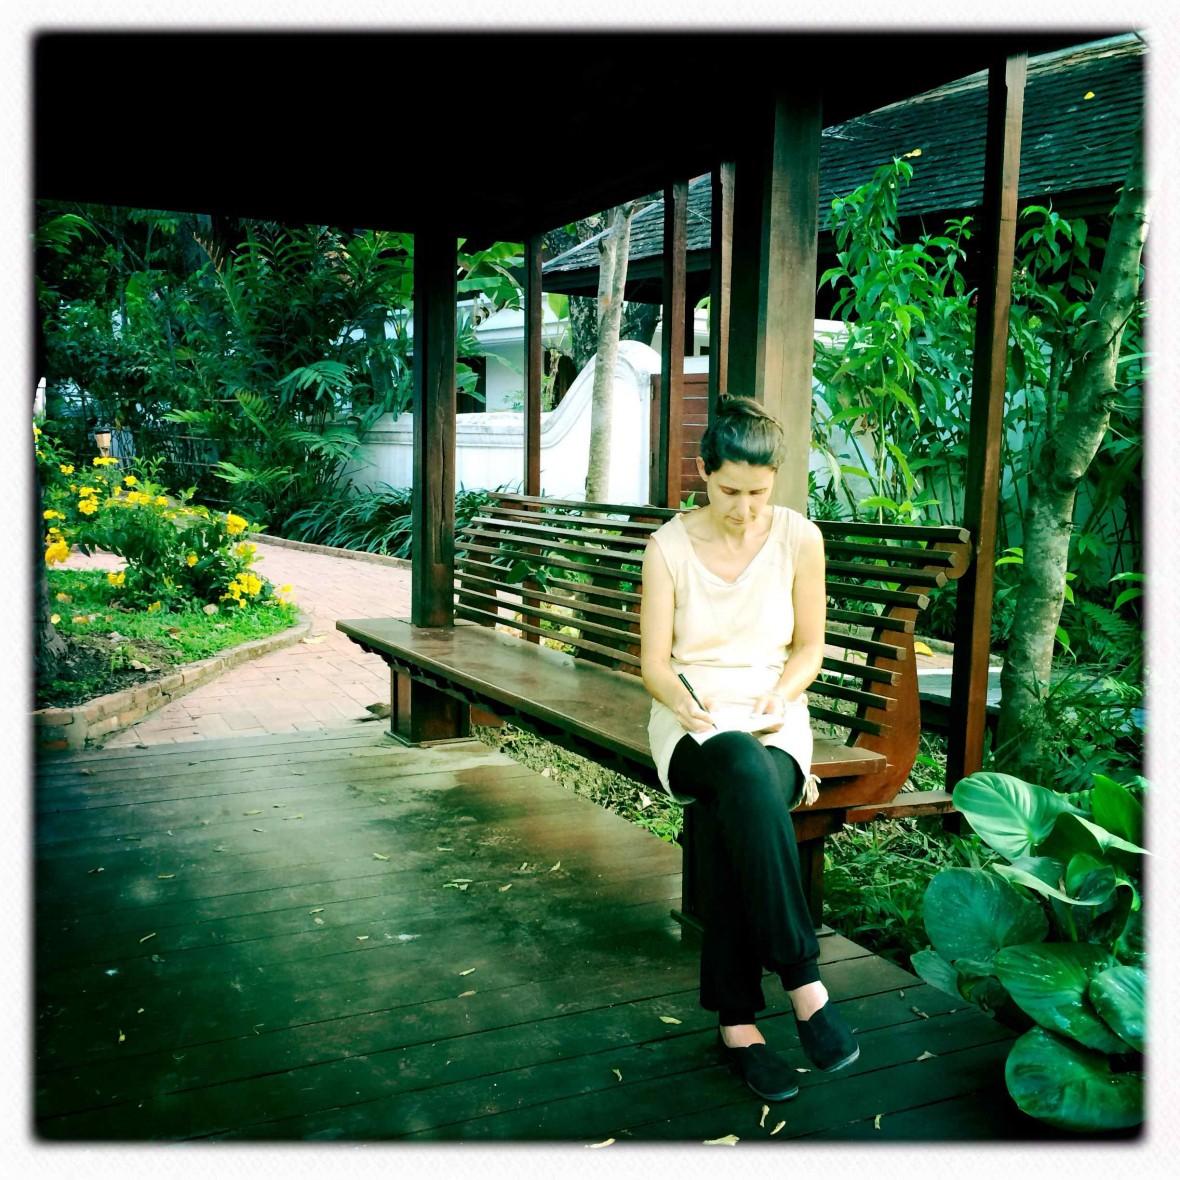 Turismo de Tailandia_Belén Alvaro_BL - TAILANDIA por JE (7)